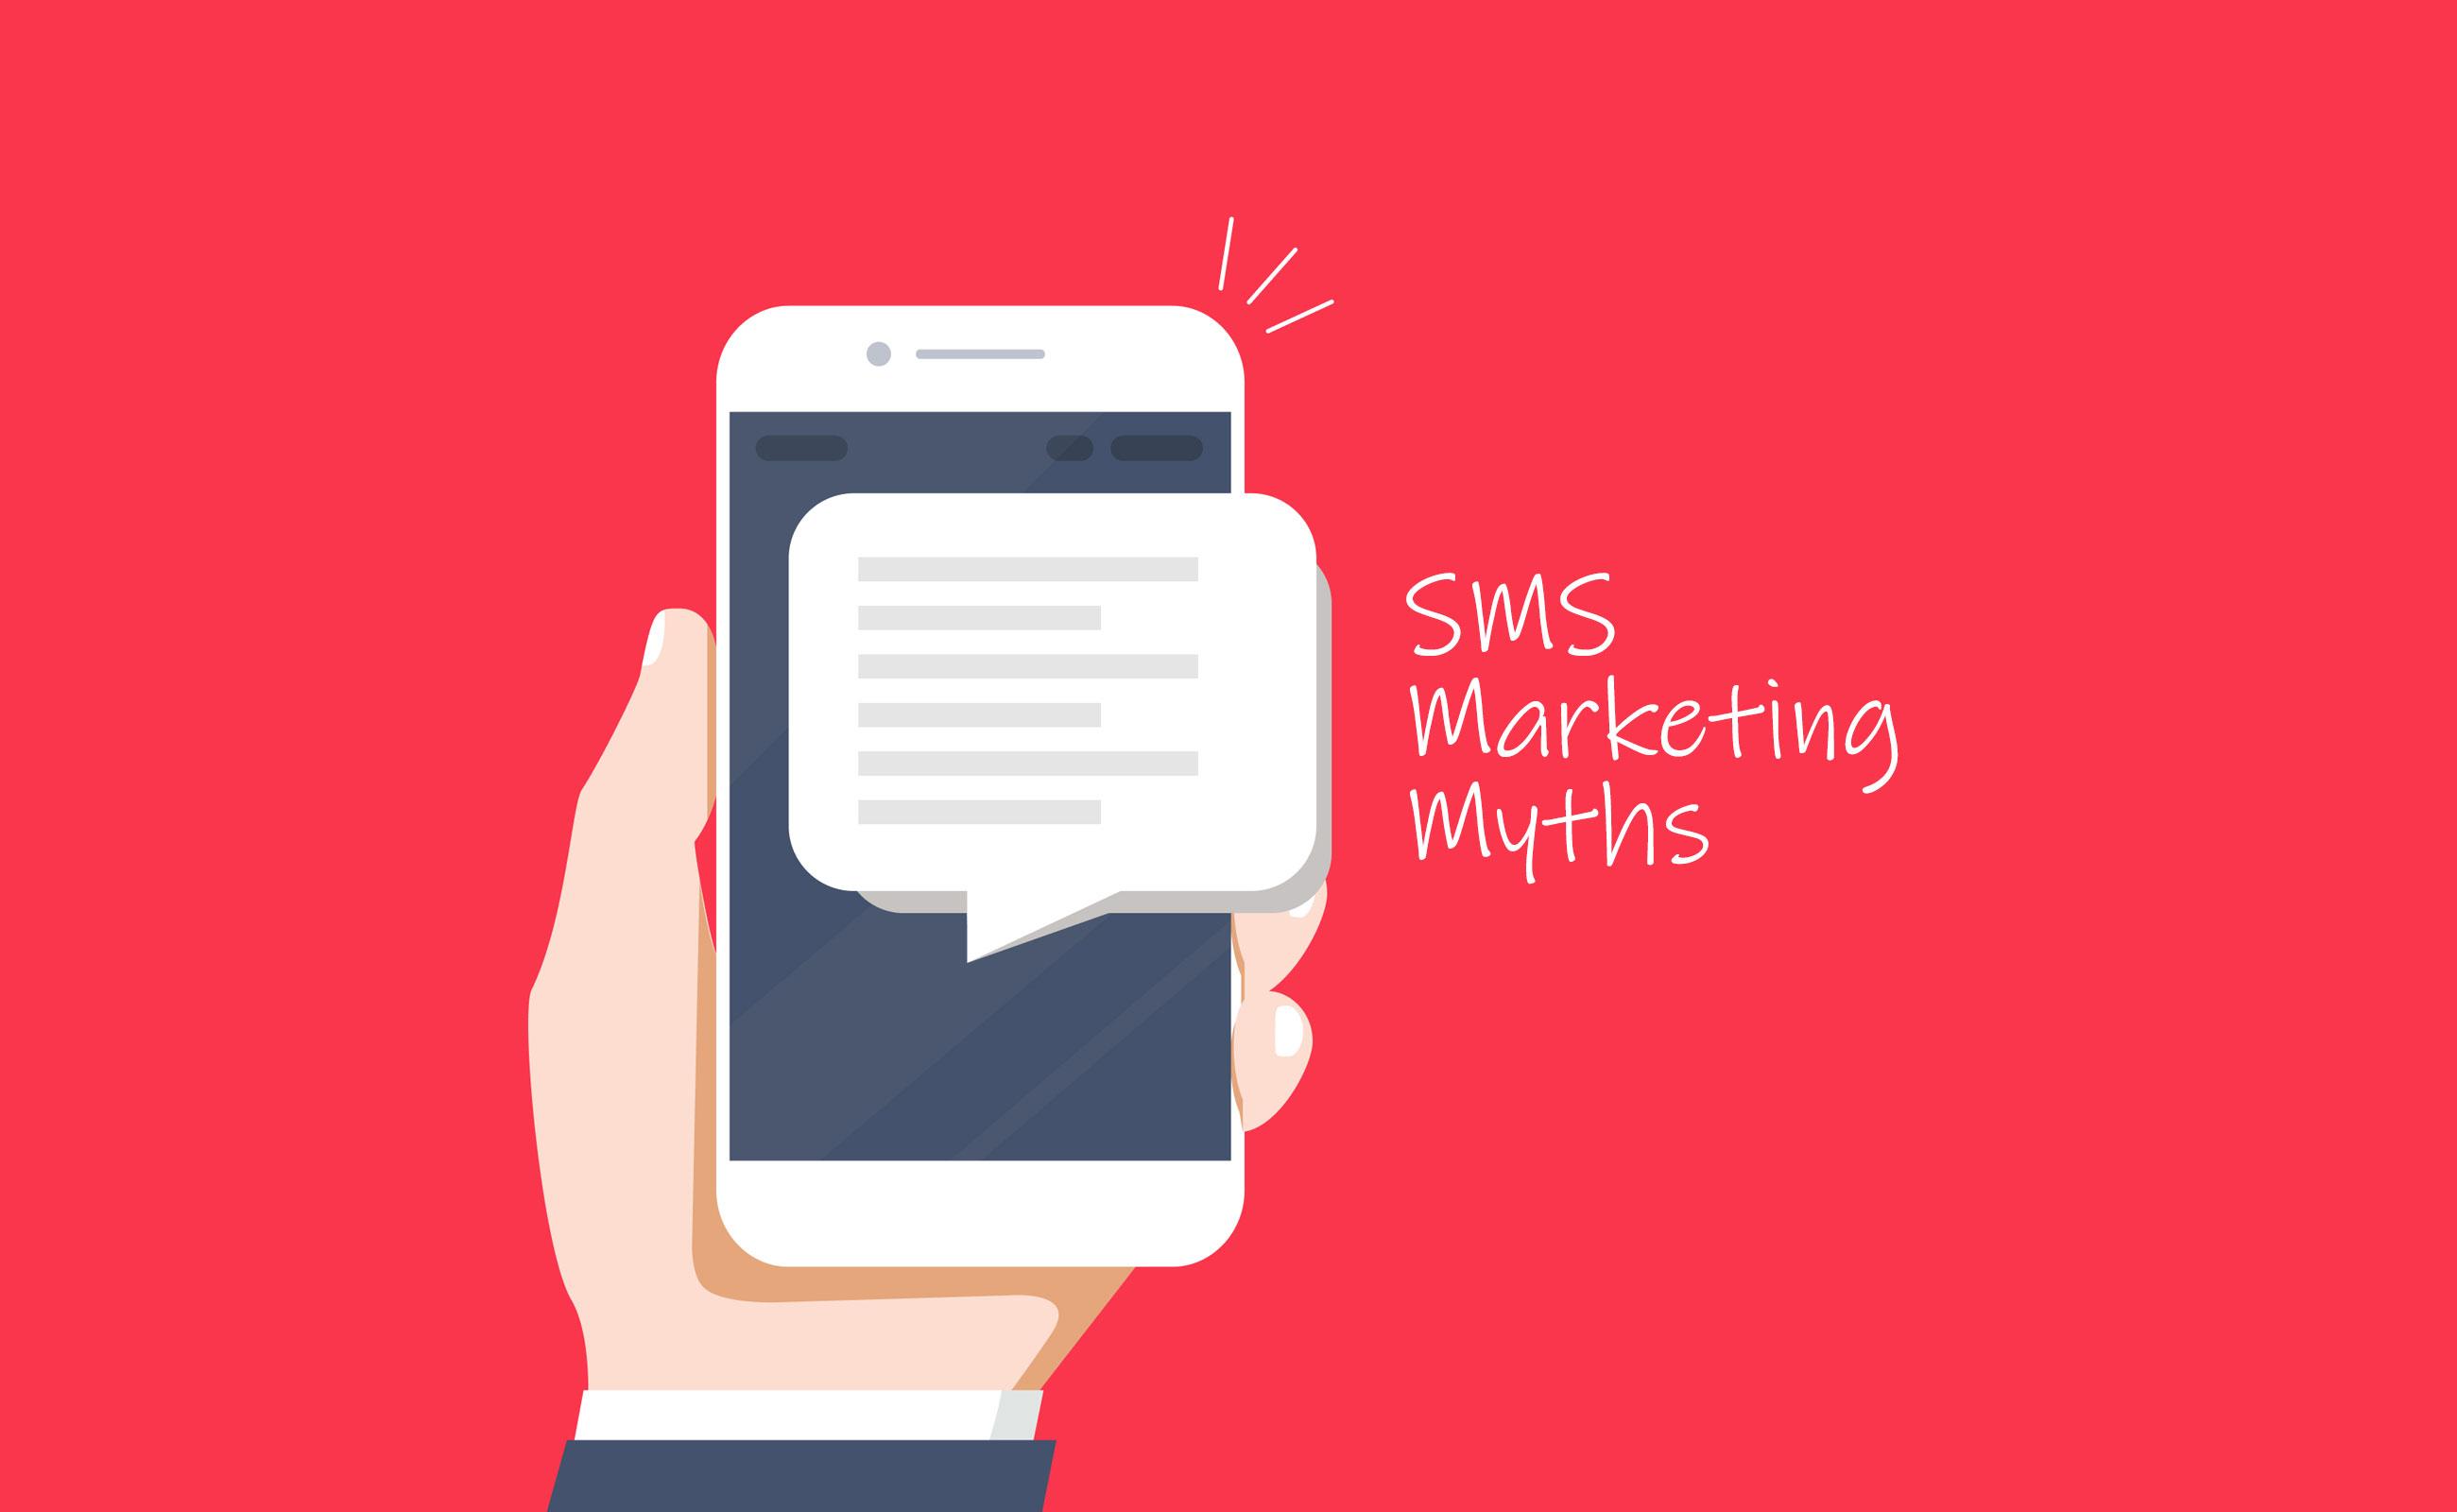 SMS Marketing Myths